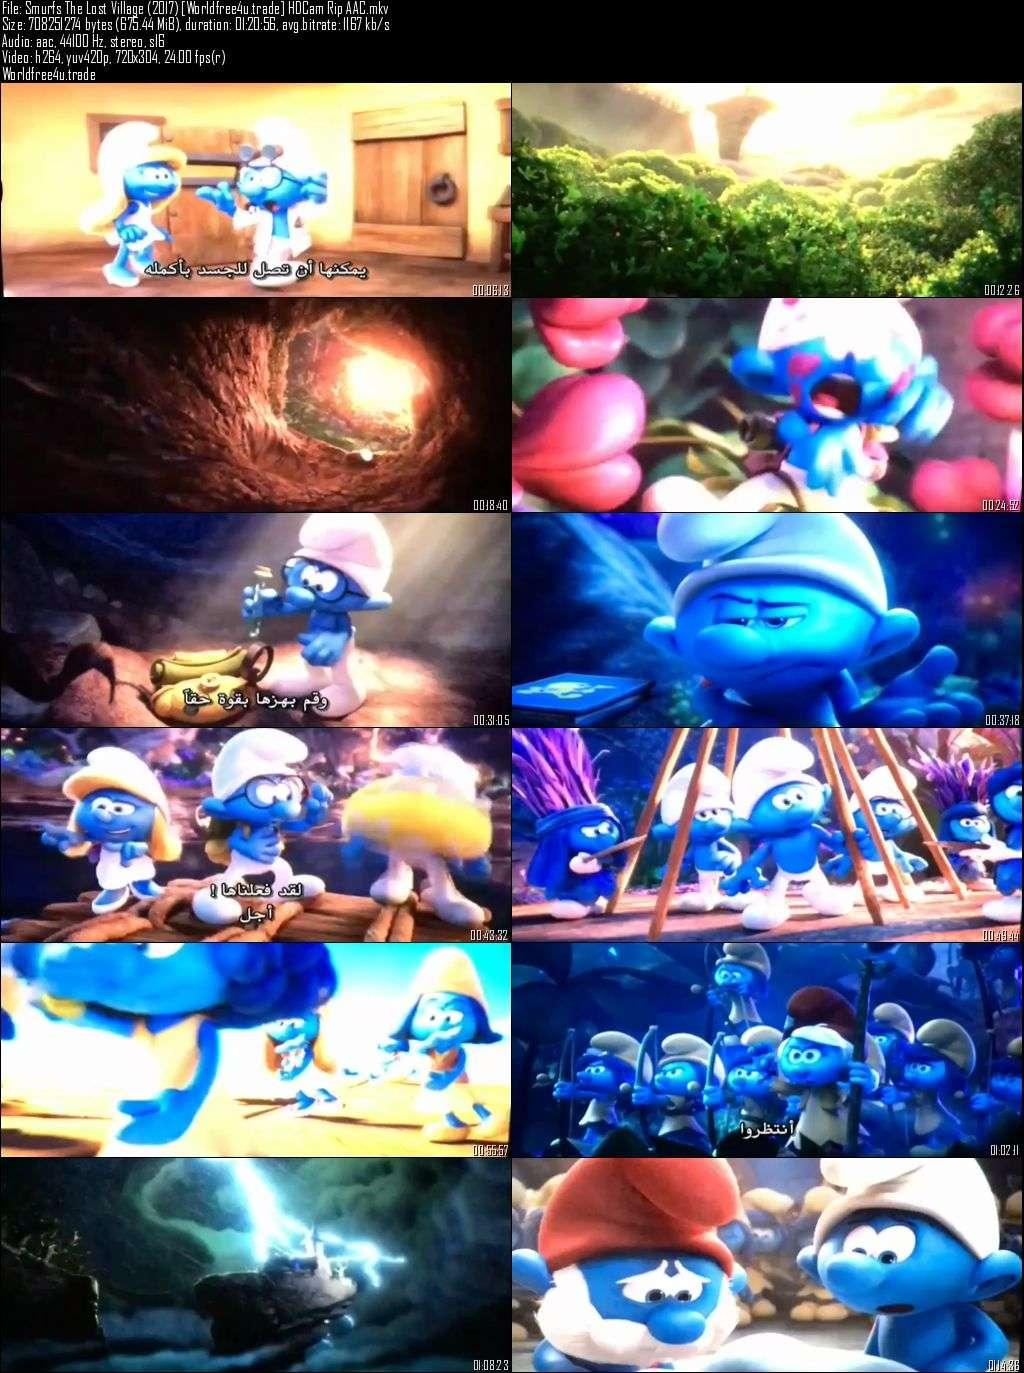 Screen Shots Smurfs The Lost Village (2017) Full Movie Download Dual Audio Hindi